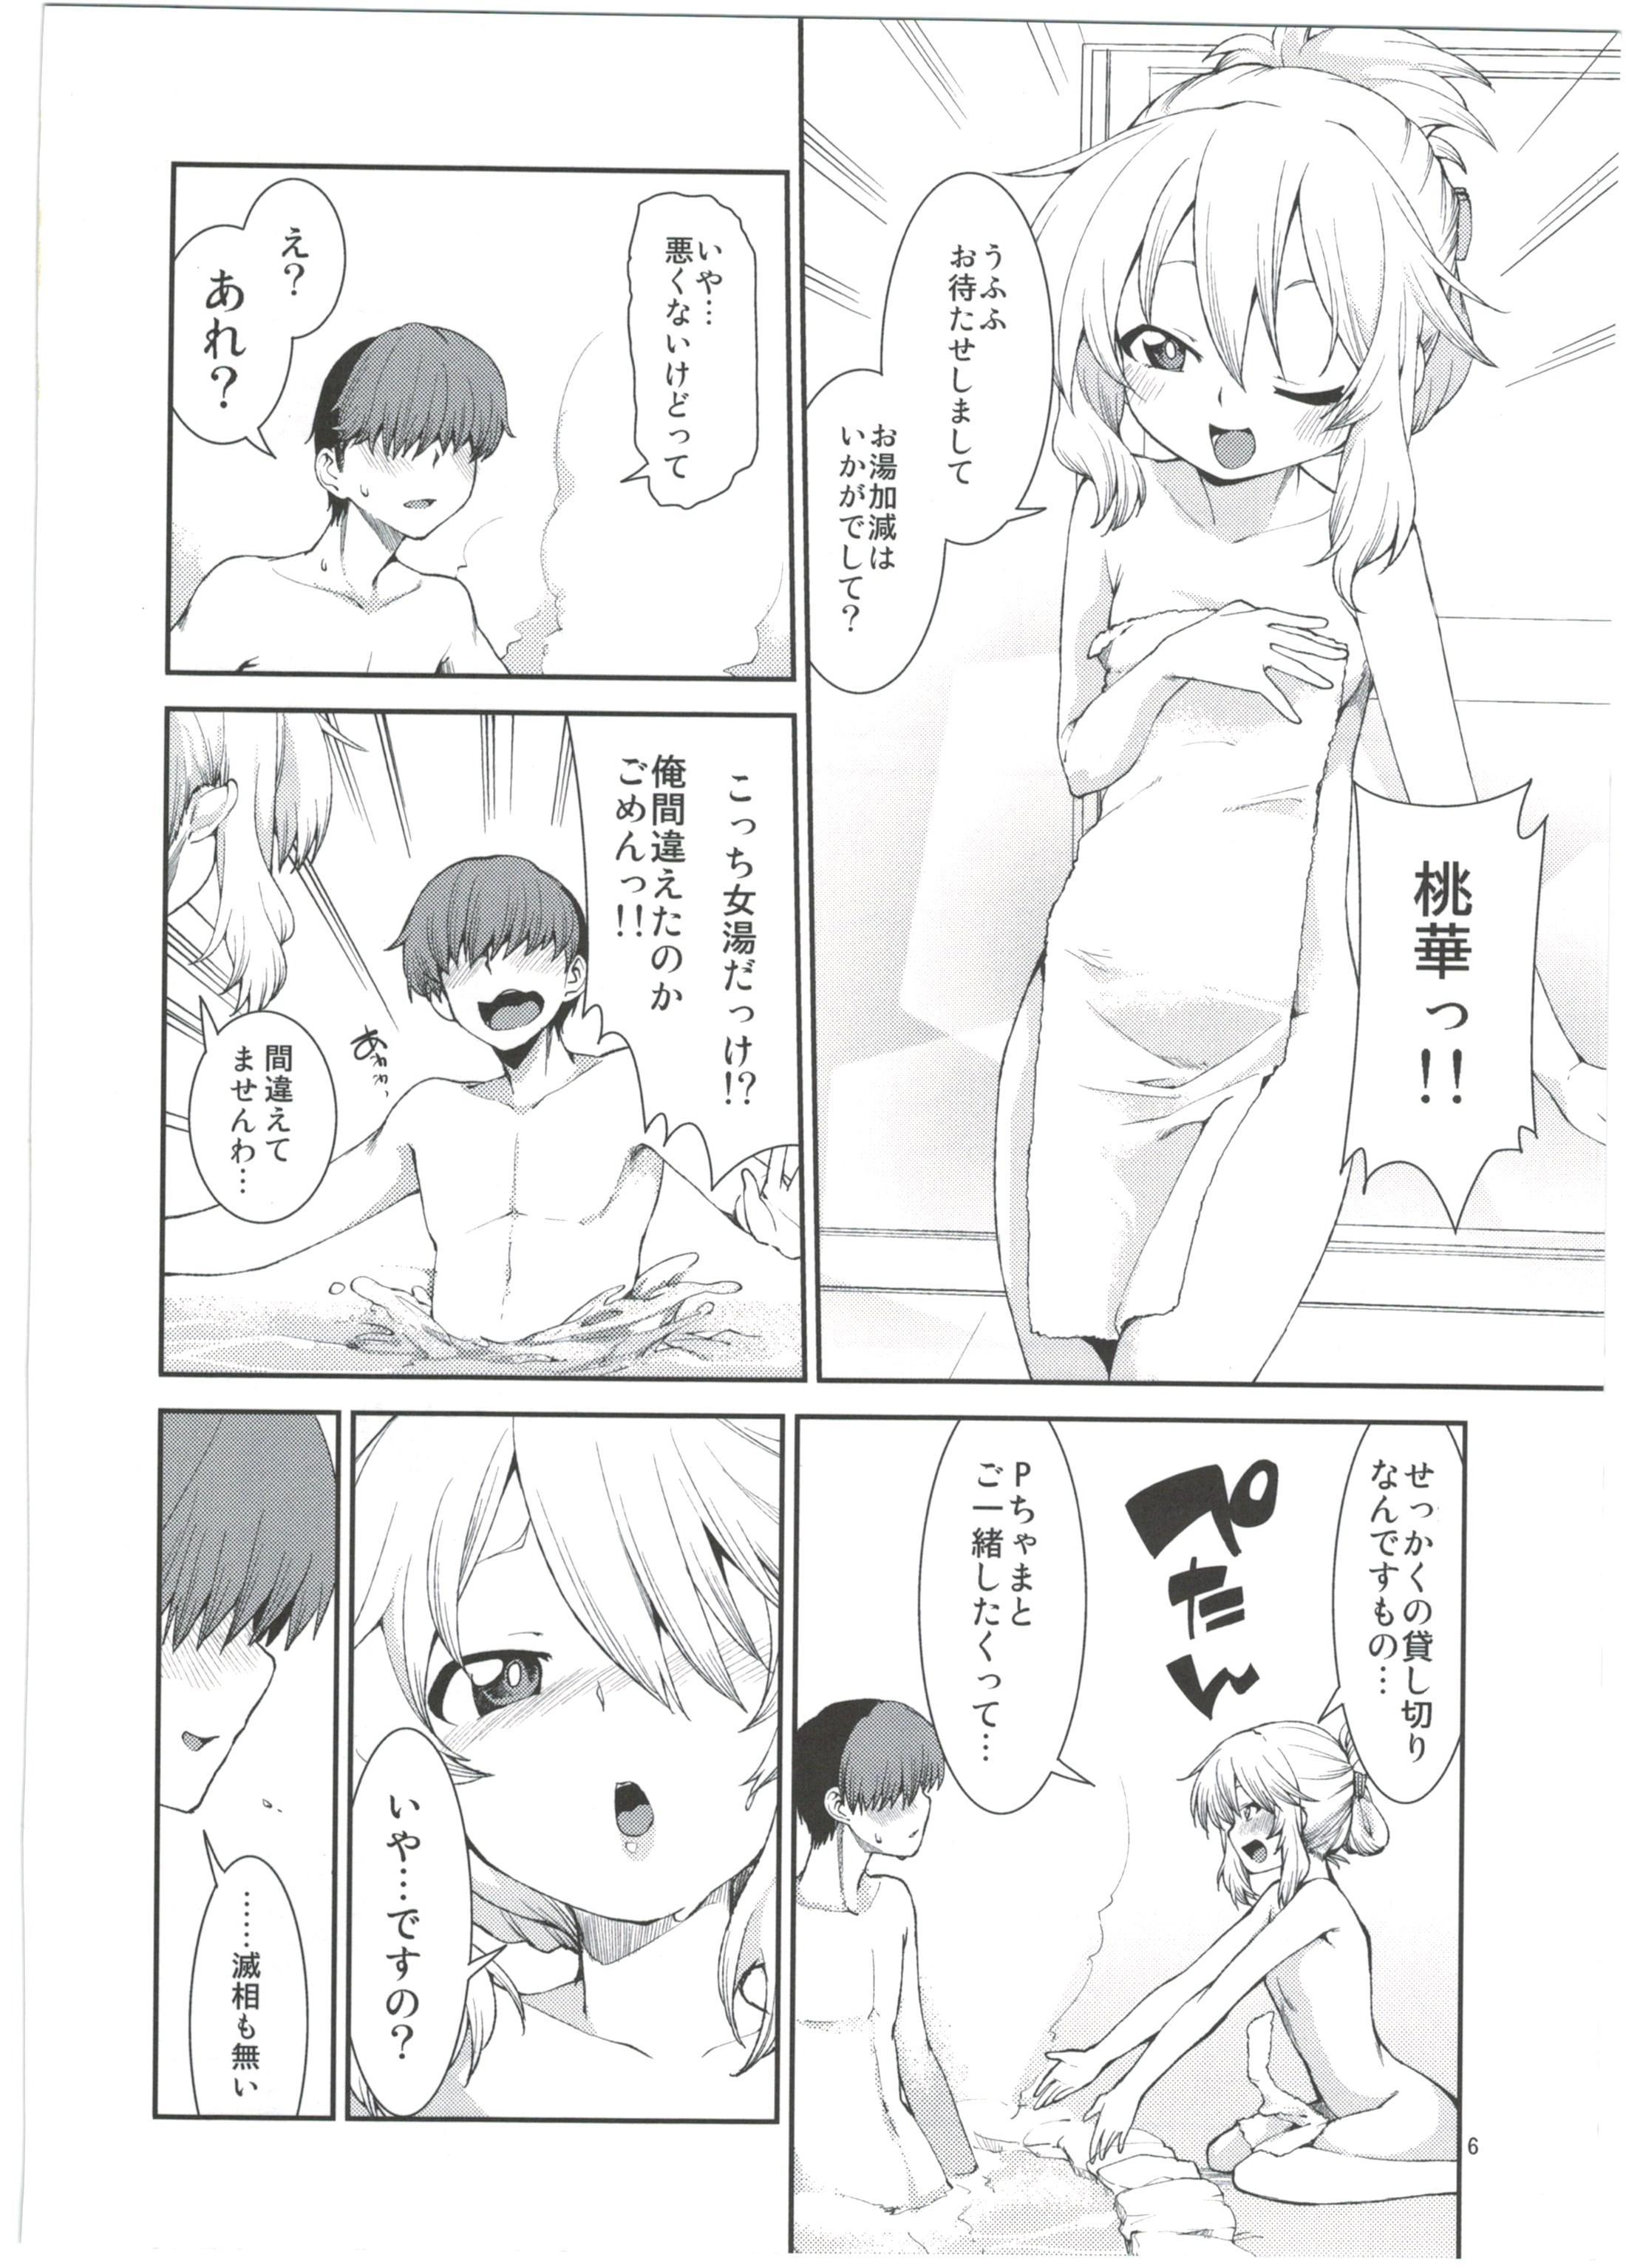 Momoka to Yukemuri Produce 7